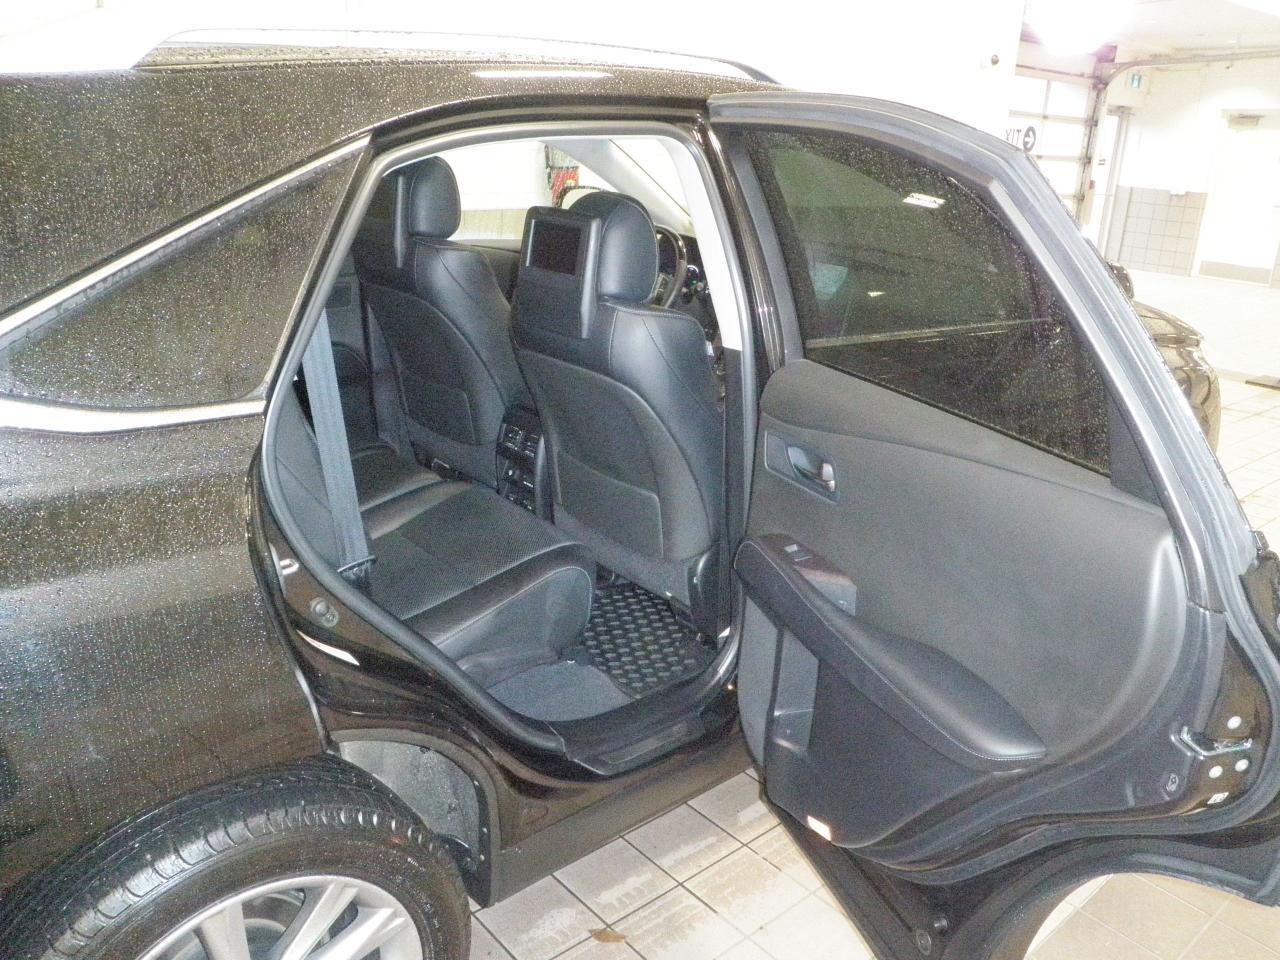 2015 Lexus RX 450h HYBRID LEXUS TOP PACKAGE EXECUTIVE